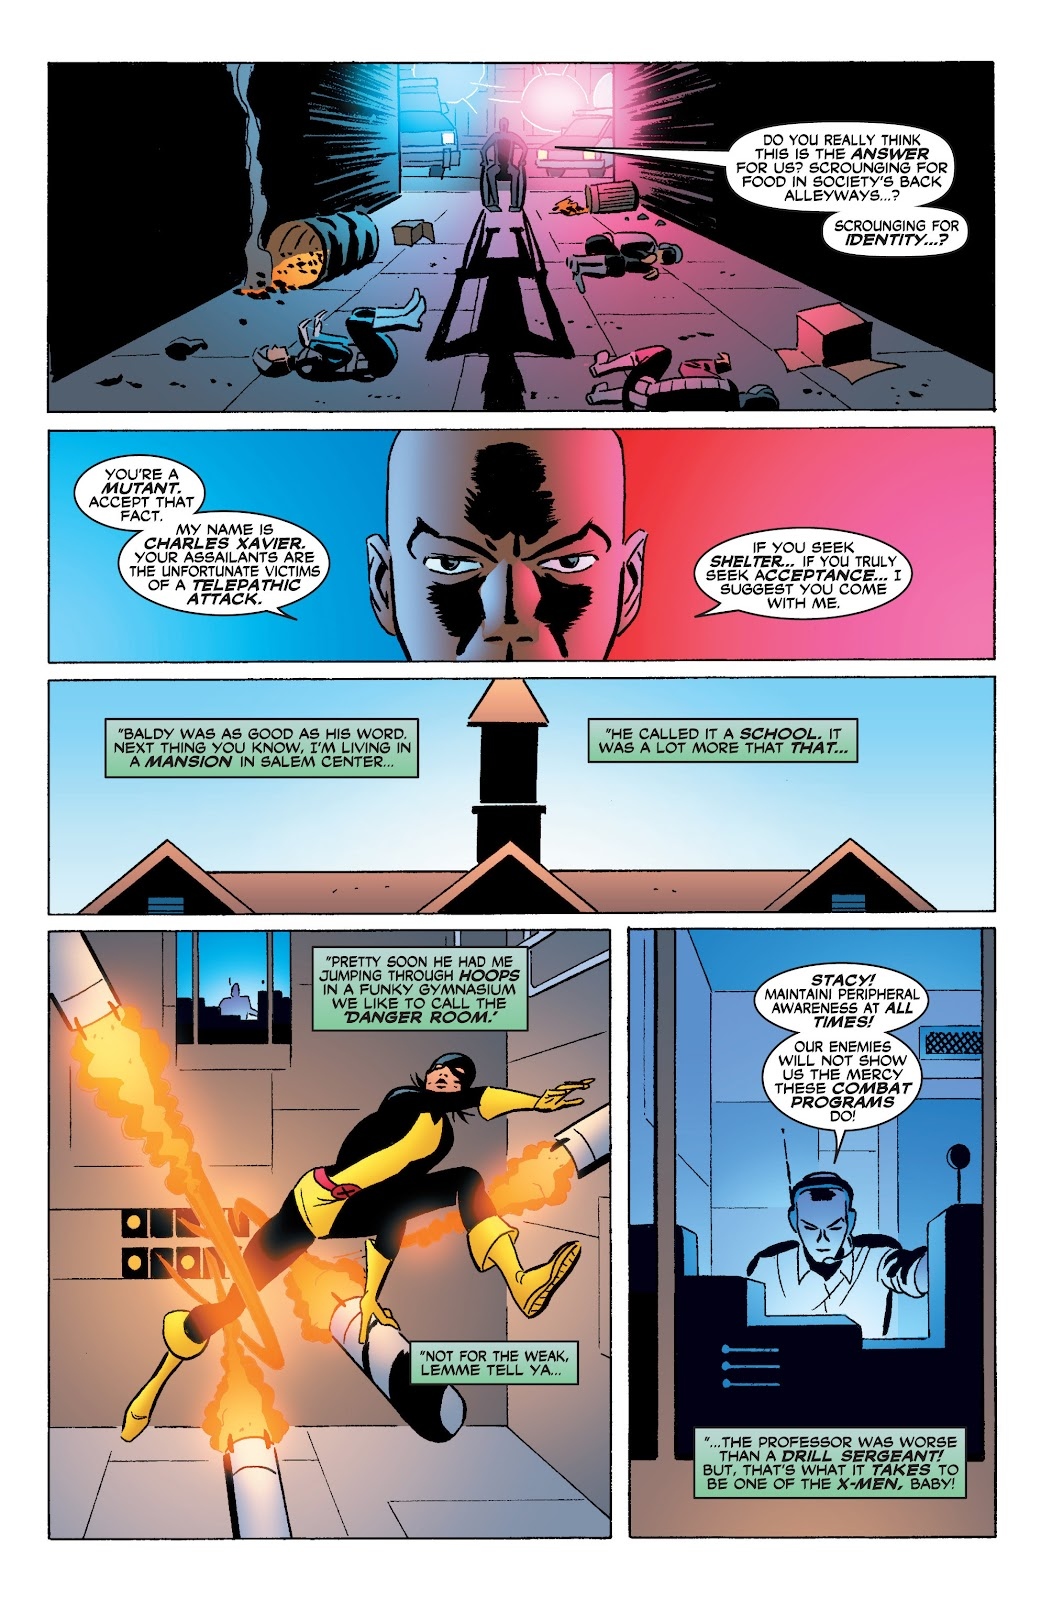 #400 1963 series Uncanny X-Men